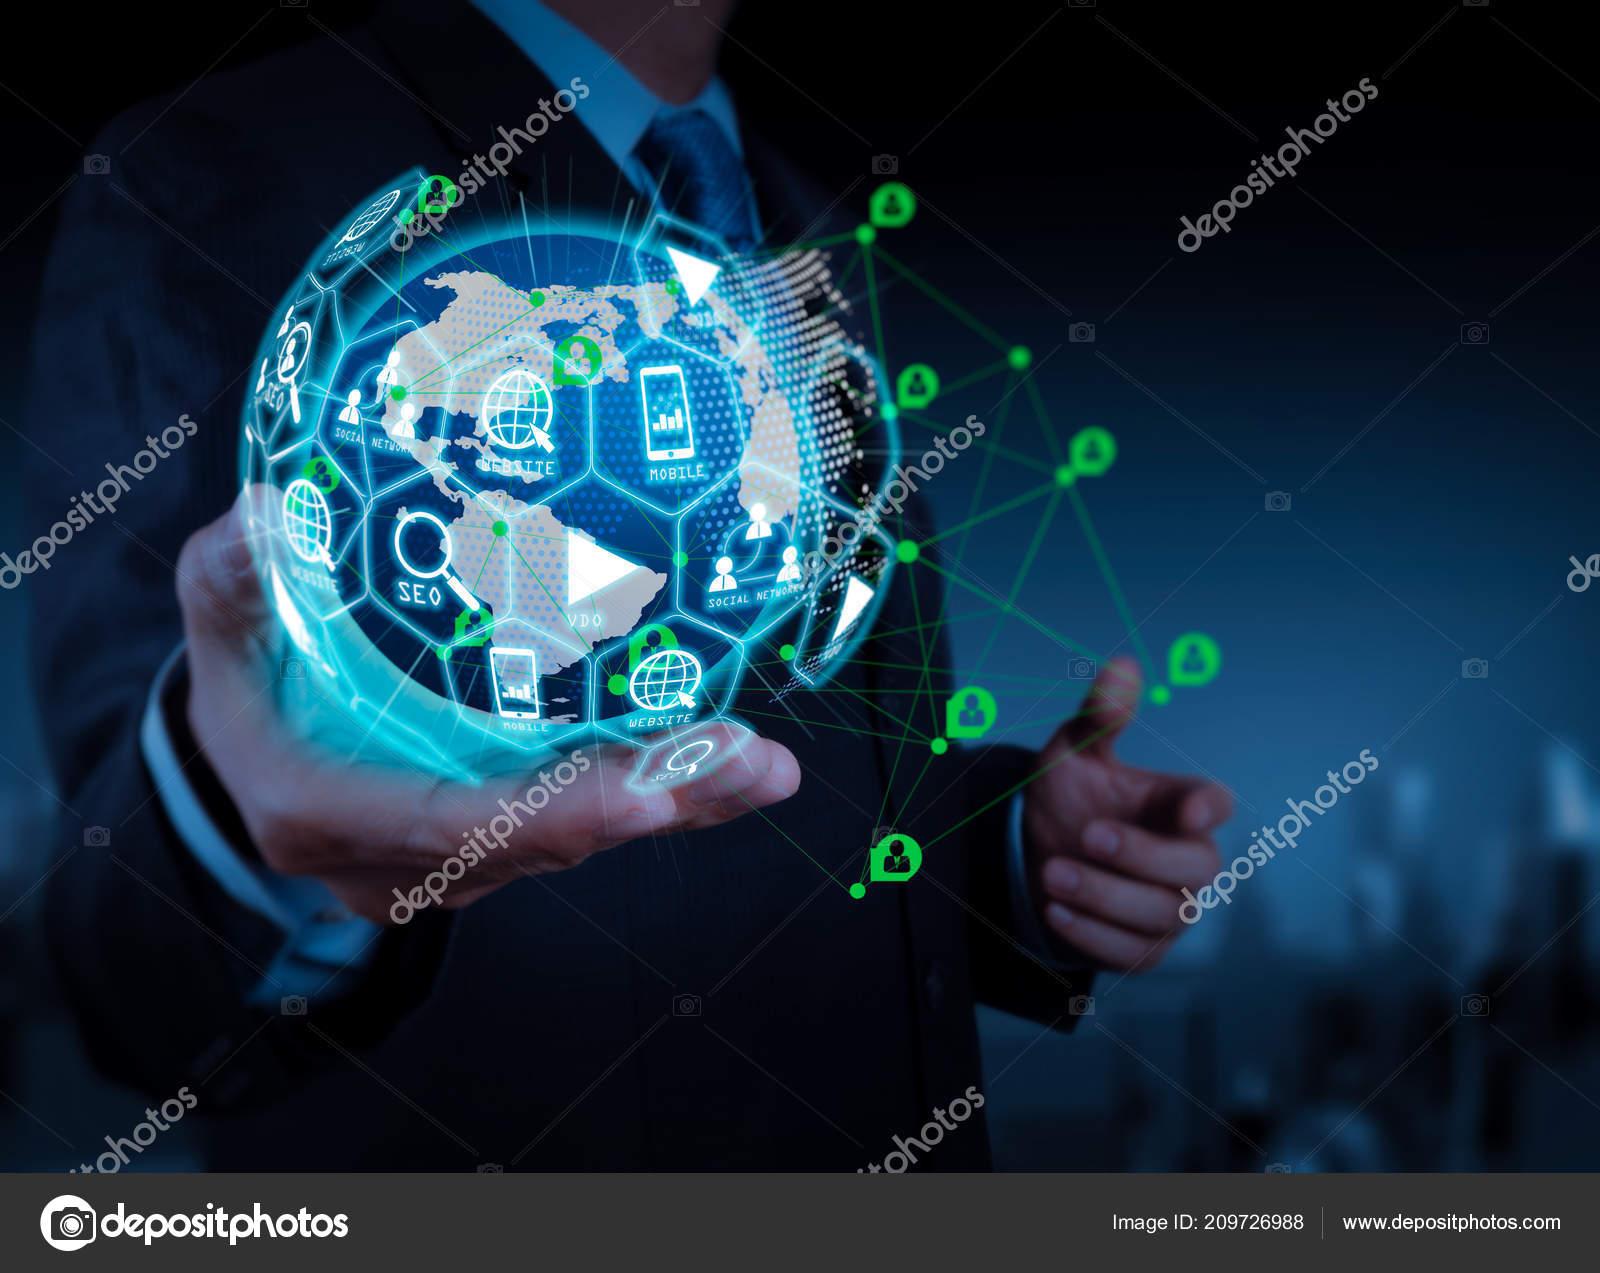 Digital Marketing Media Website Email Social Network Seo